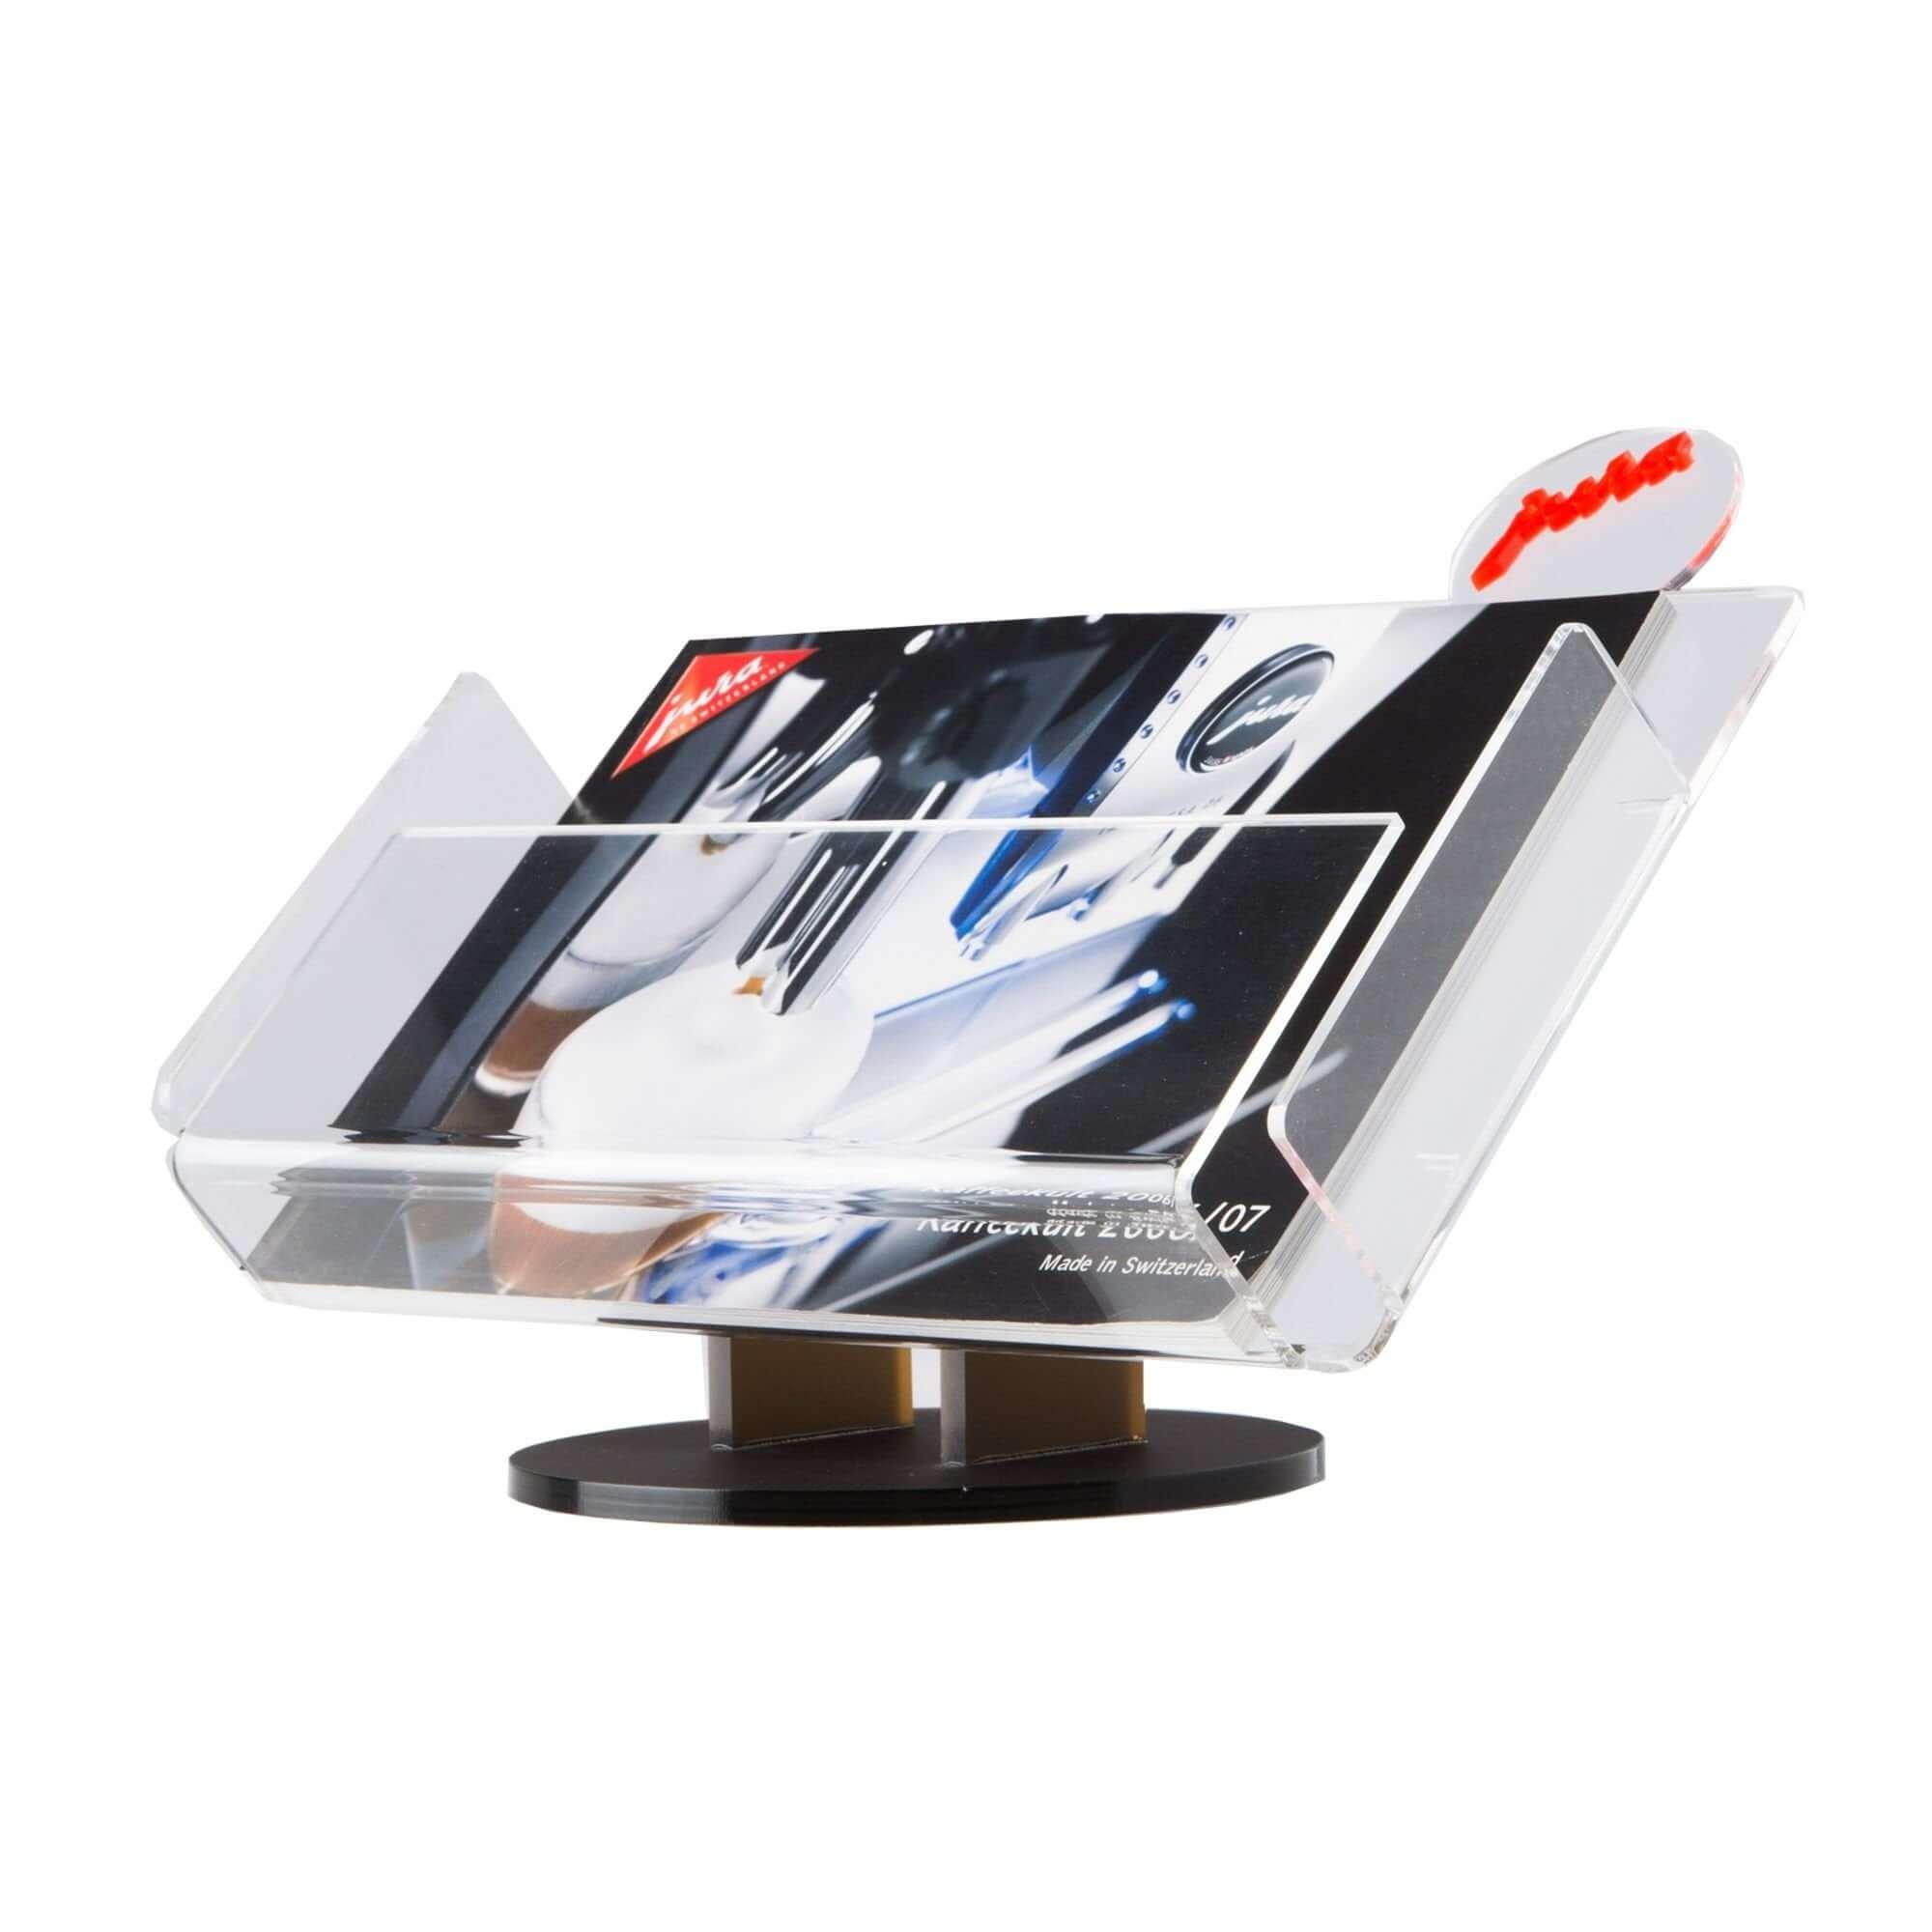 Acryline Prospektständer aus Acrylglas acryl kunststoff prospektehalter prospekthalter broschürenhalter werbehalter prospekte halter display verkaufsförderung aussteller